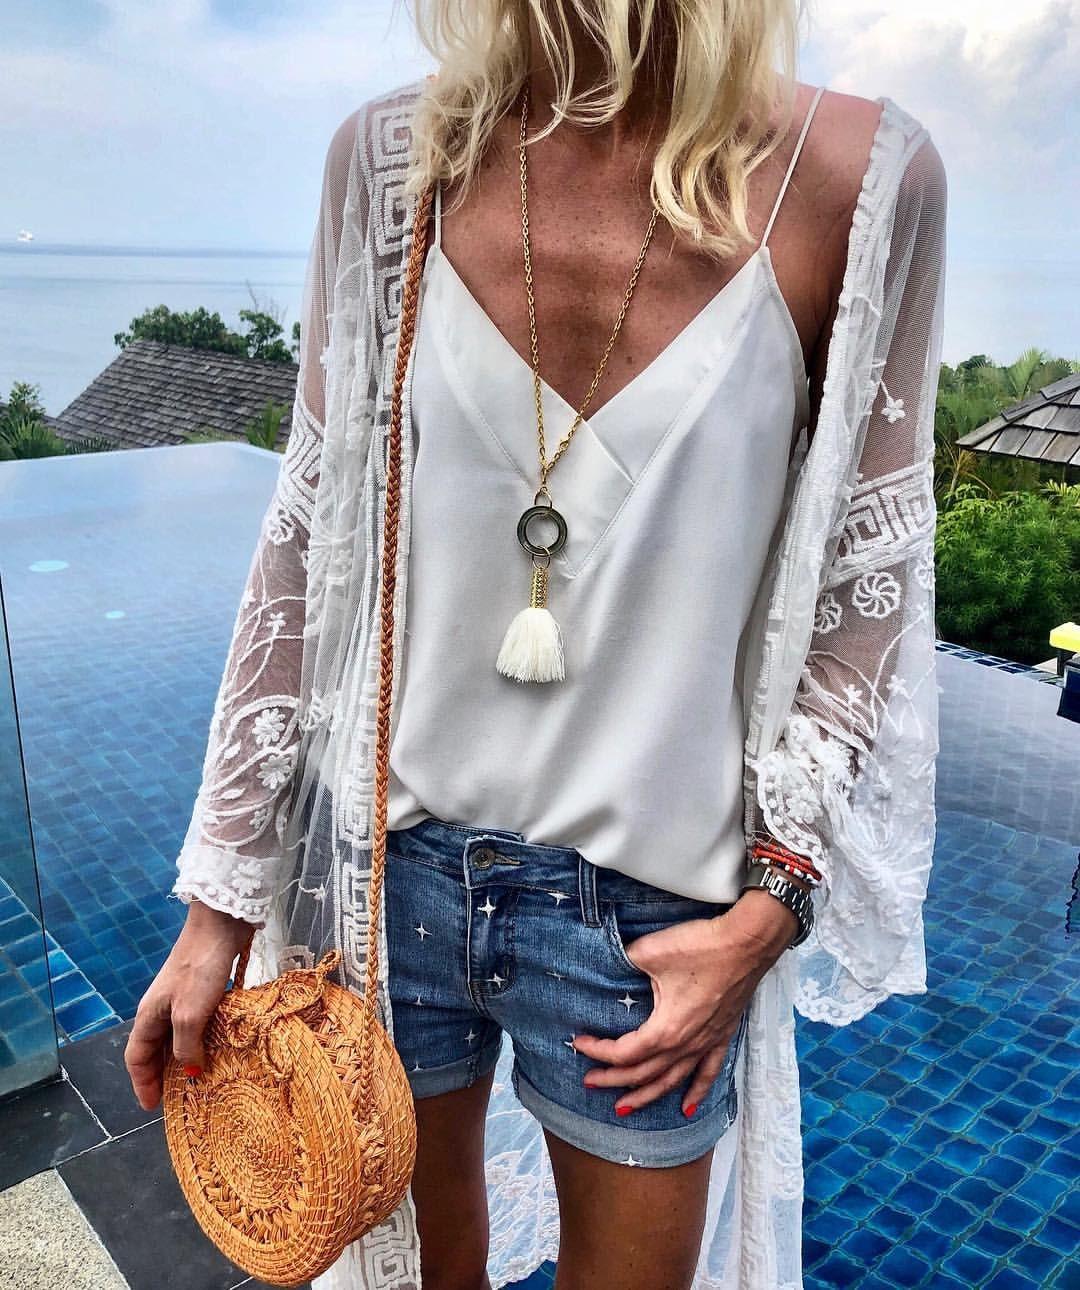 "Anna Skoog on Instagram: ""✨Denim & White✨ @mysteryjaneclothing kimono & shorts @isleandtribe necklace @wayuuworld bag #vacationstyle #boholuxe #phuket"" 1"